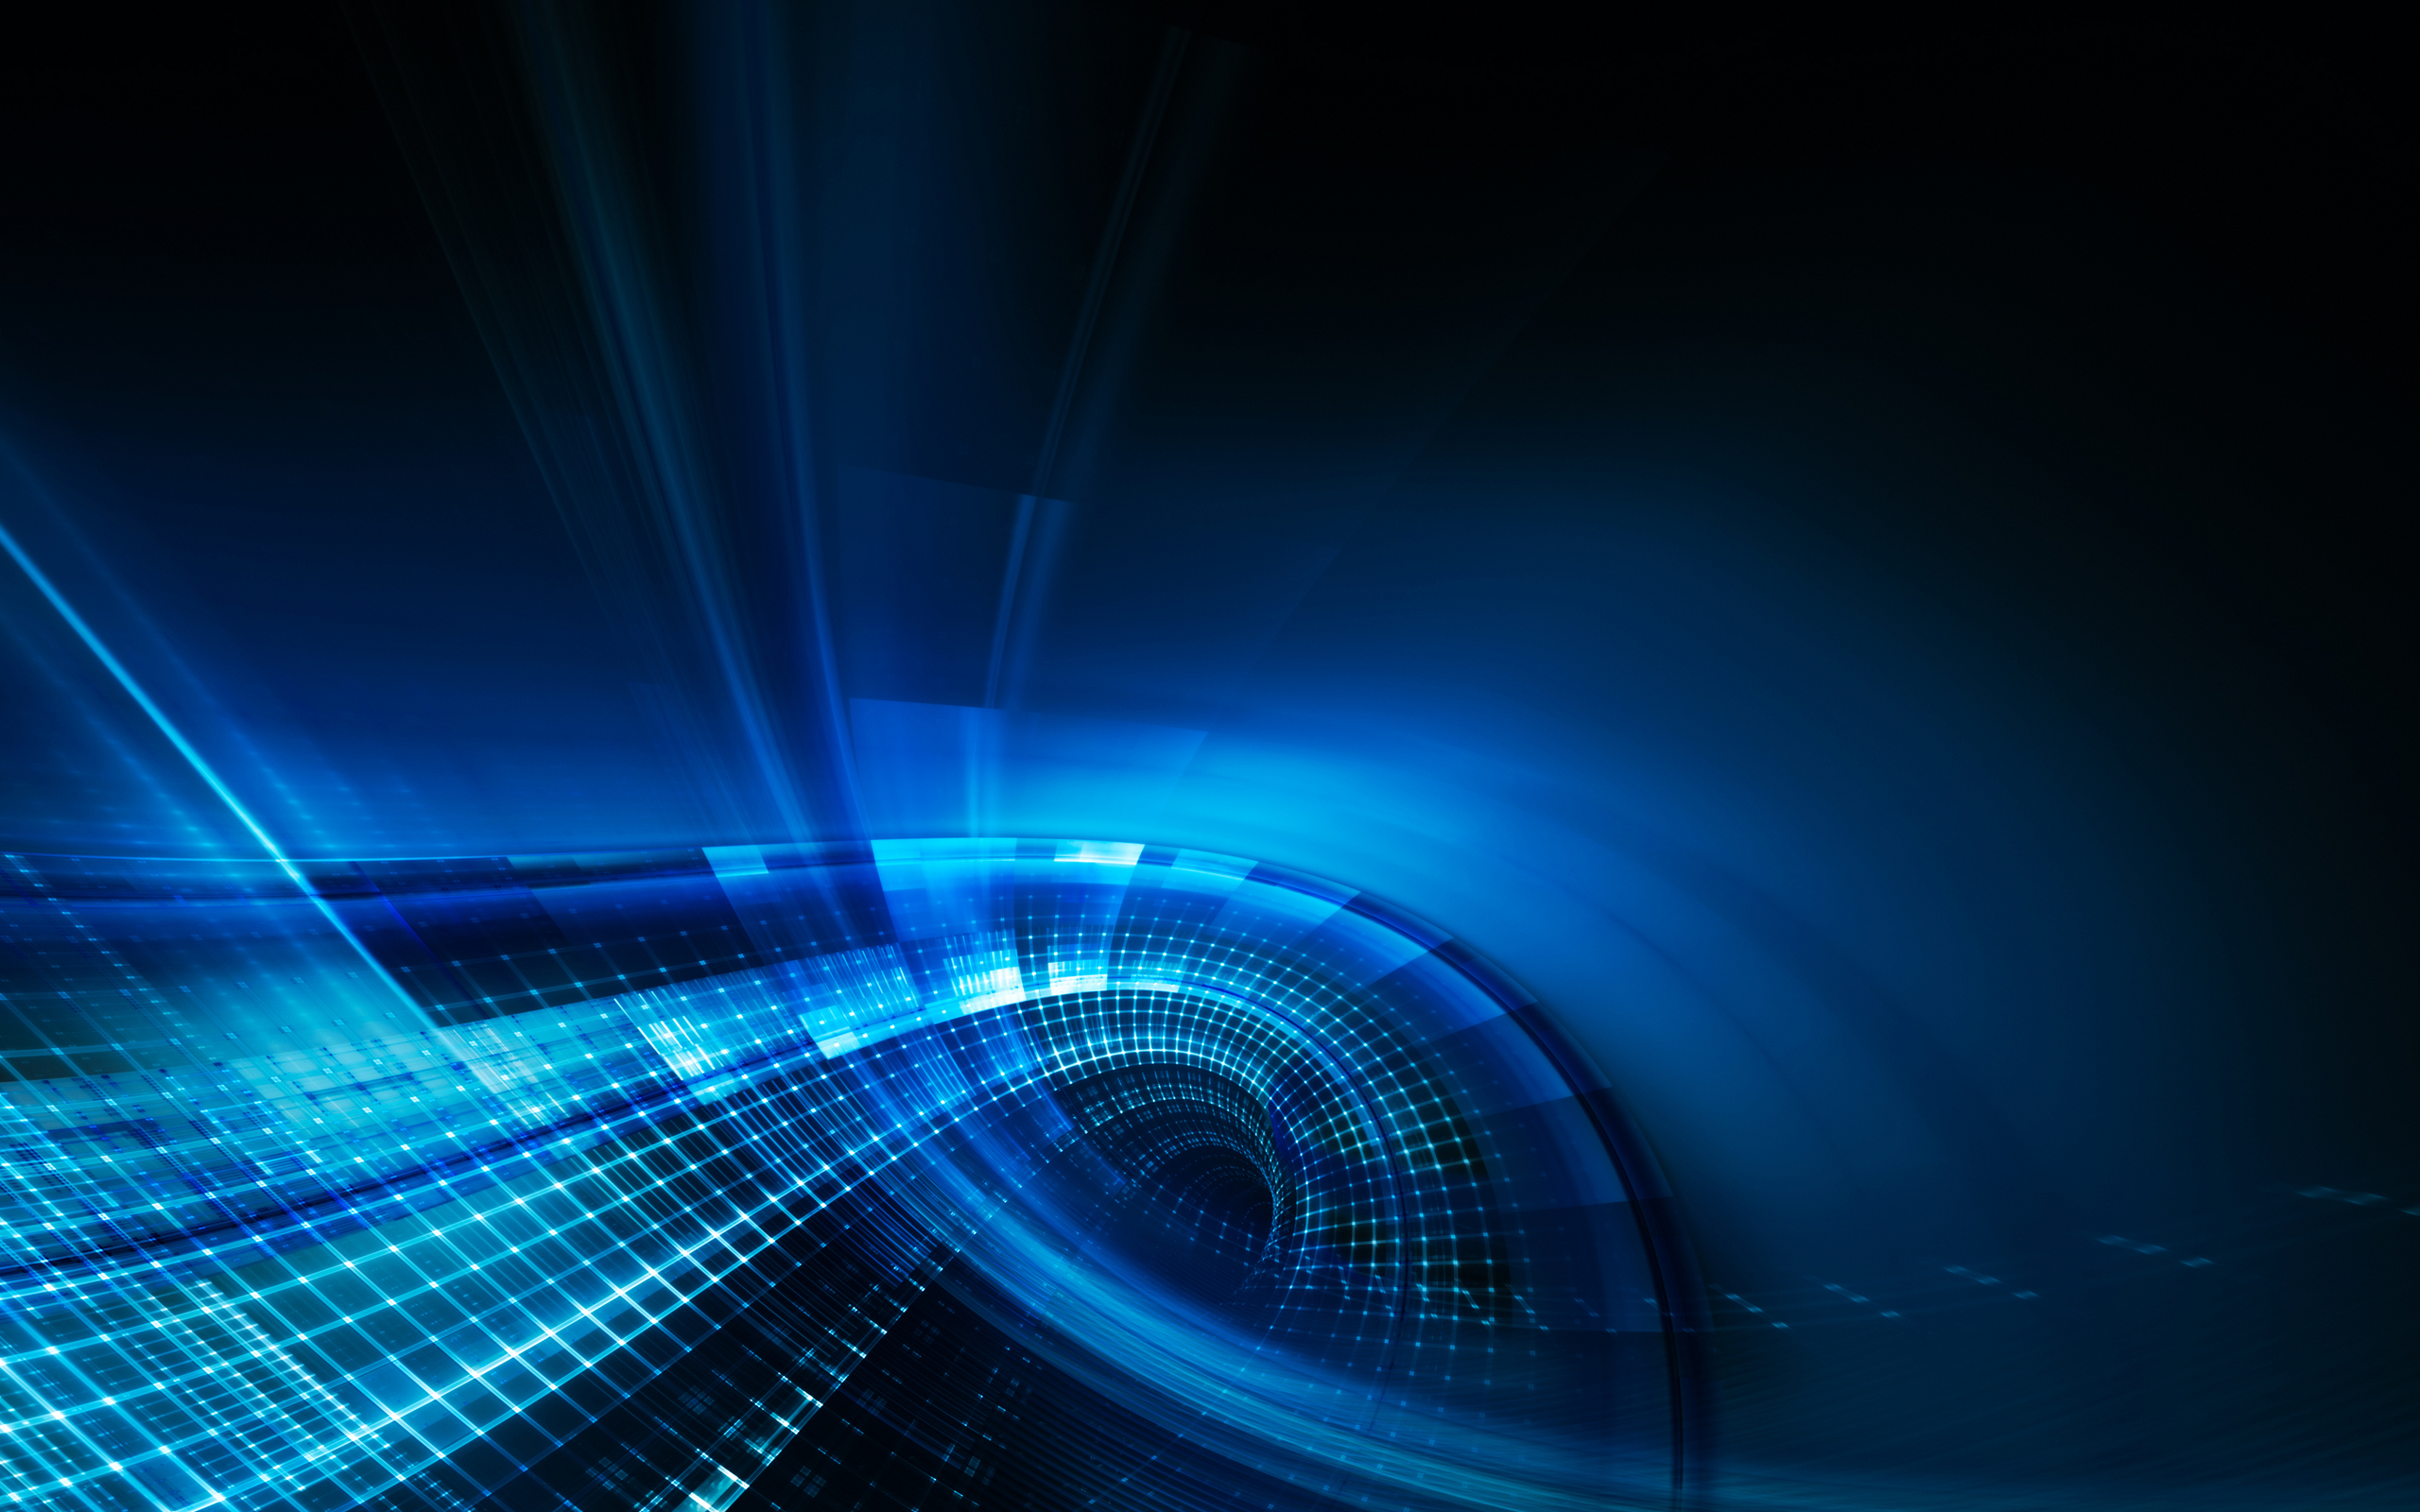 Blue Computer Wallpapers Desktop Backgrounds 2560x1600 ID302661 2560x1600